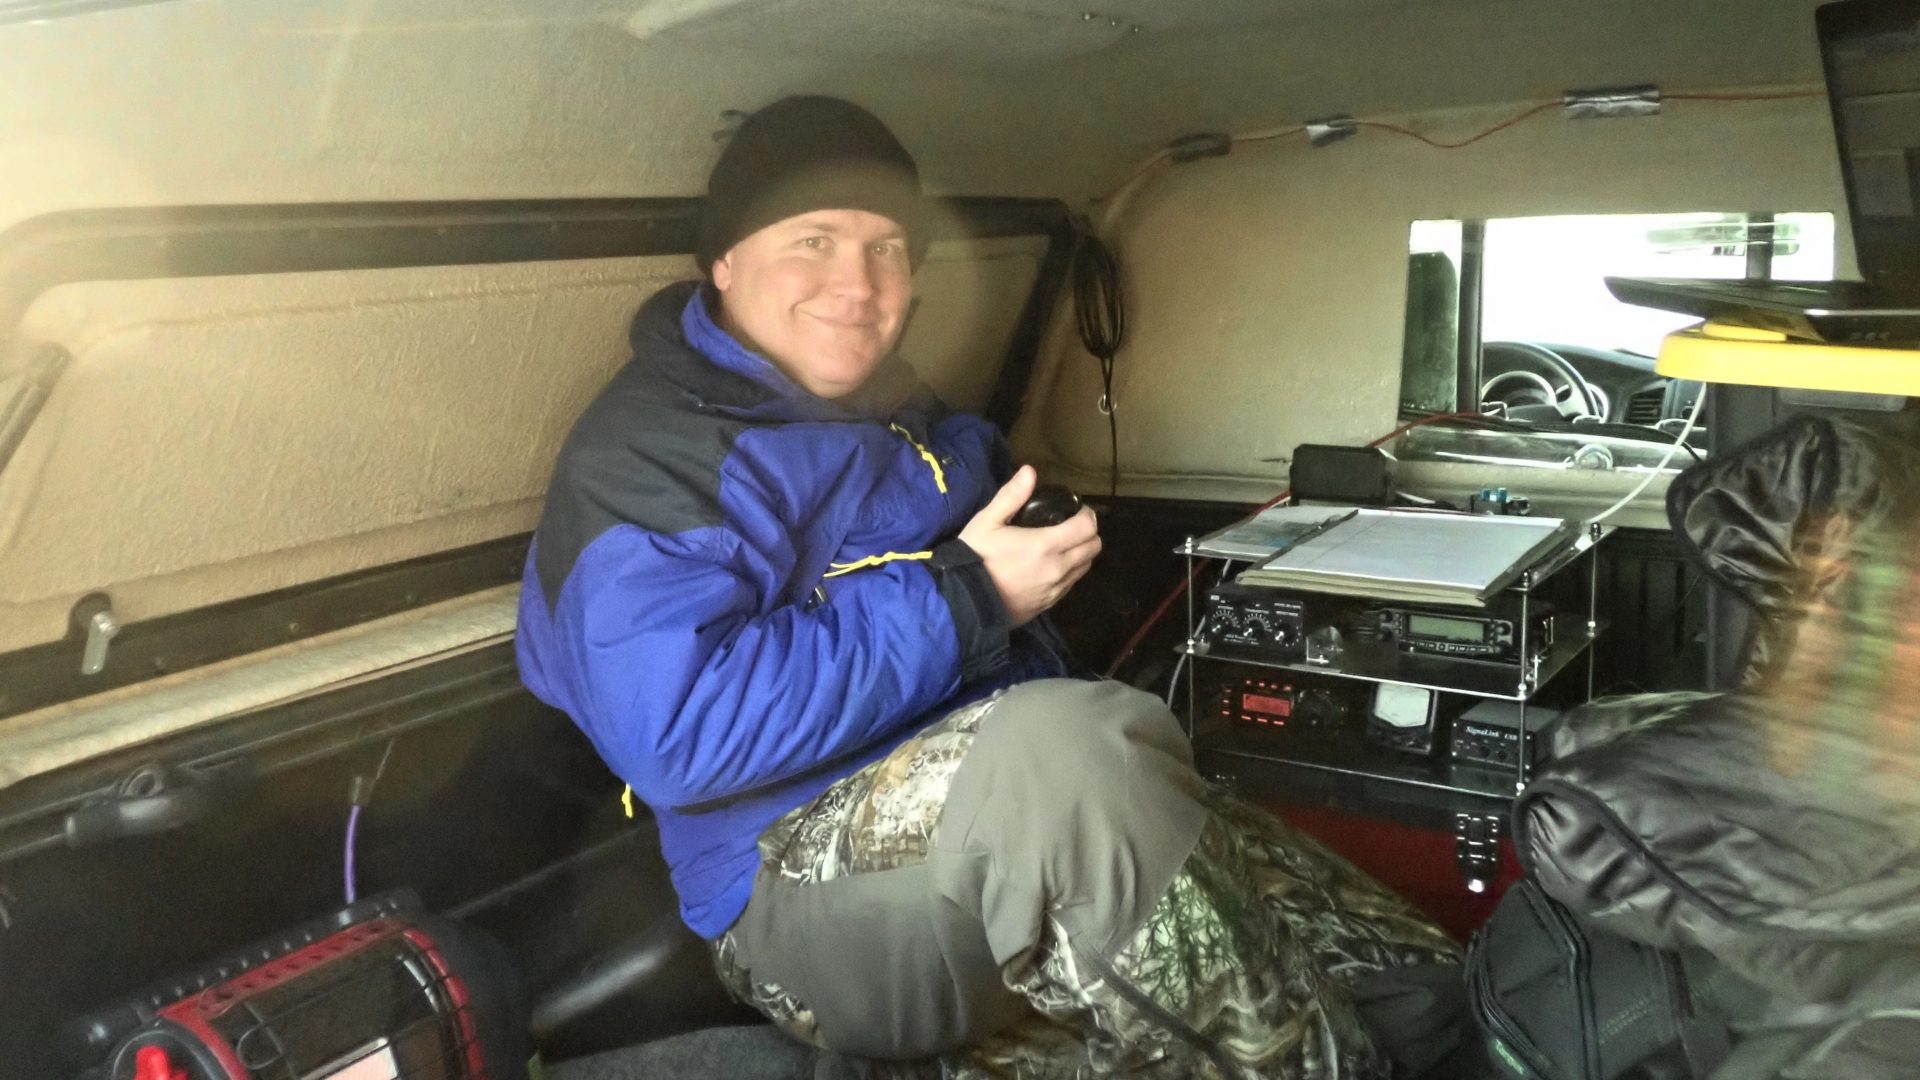 KL7BSC Brandon Clark operating in VHF contest